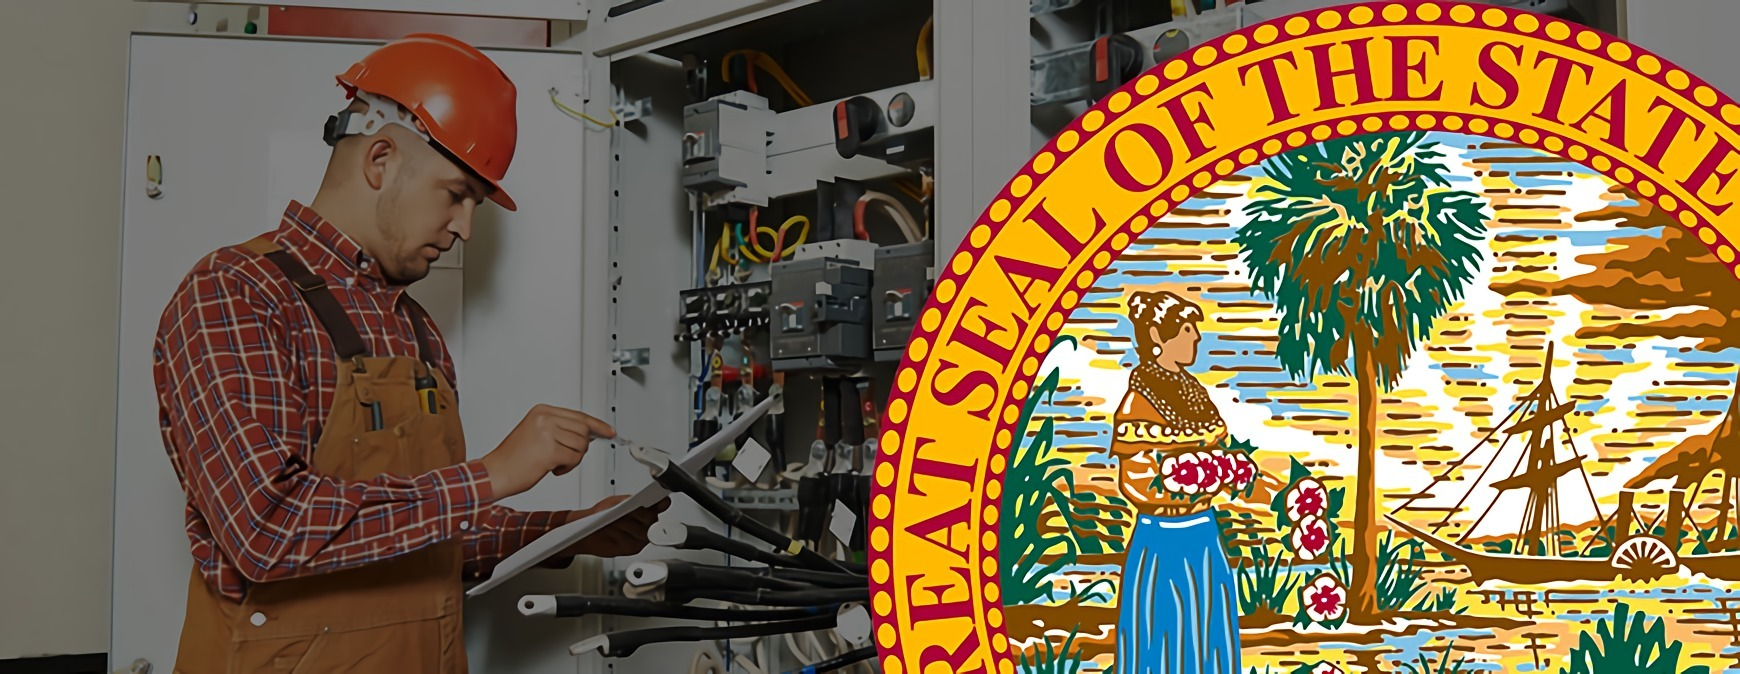 florida electricians